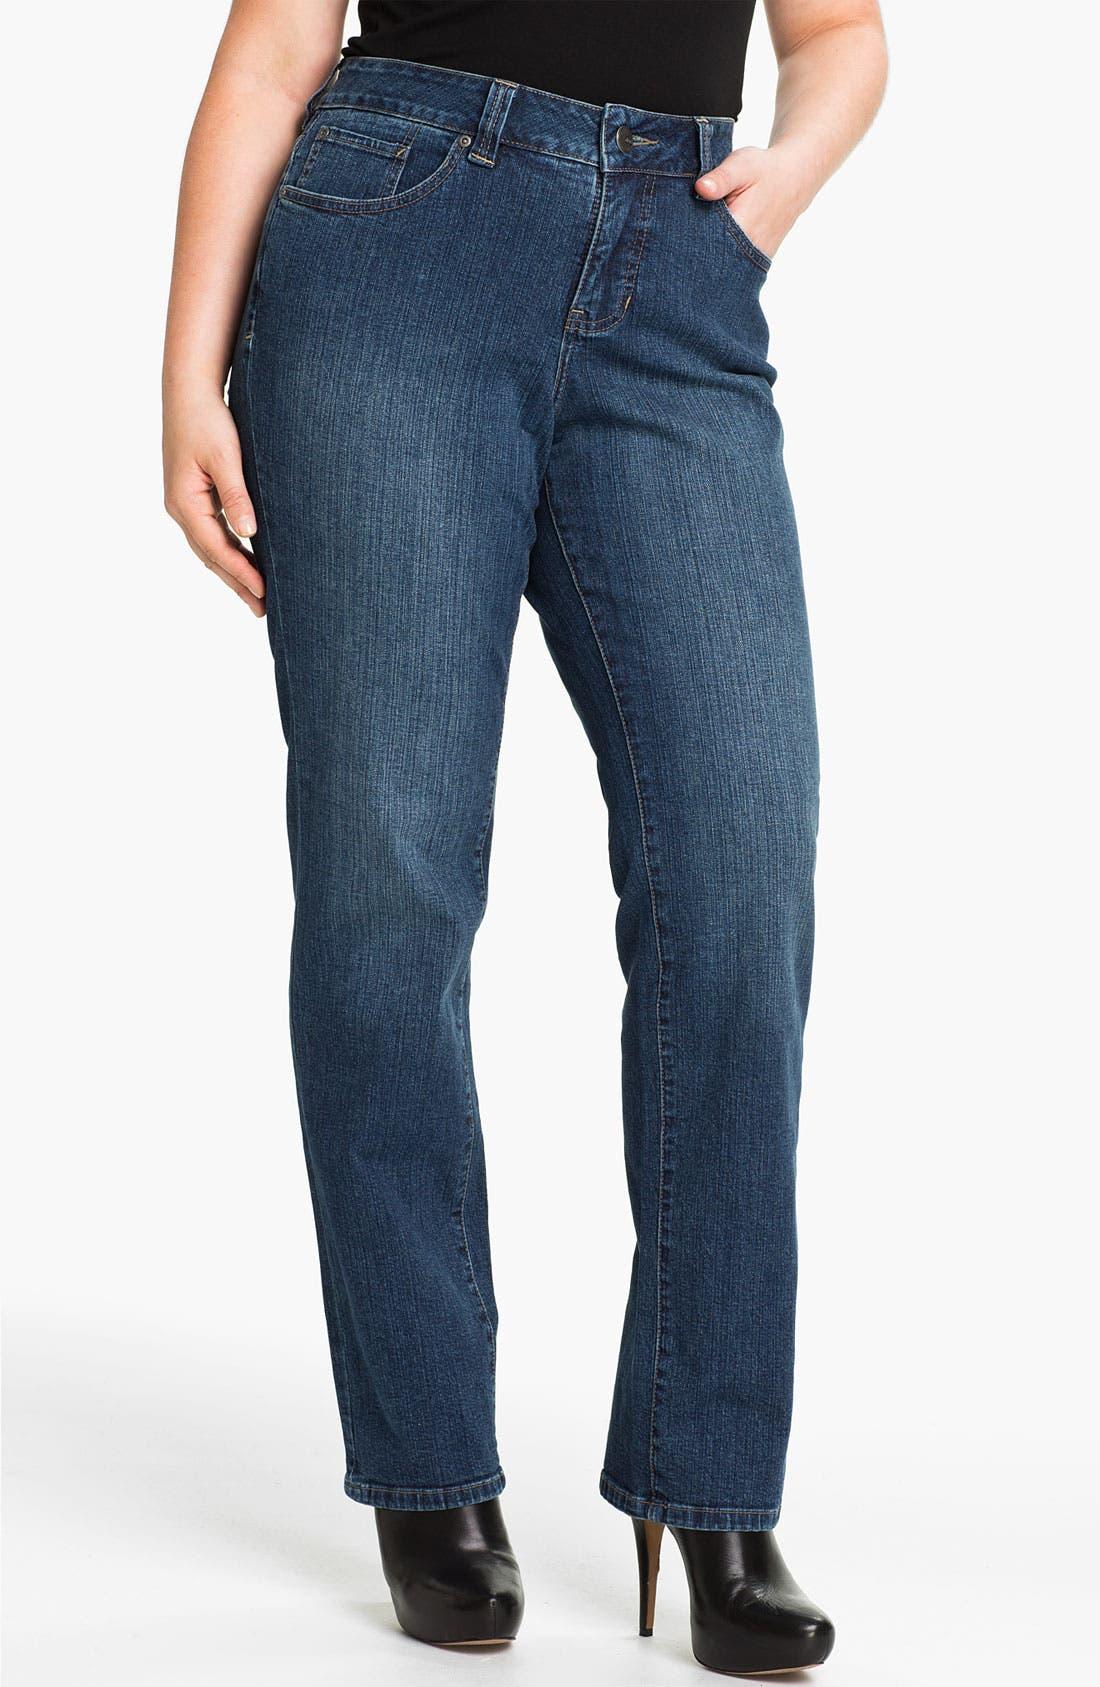 Alternate Image 1 Selected - Jag Jeans 'Madison' Straight Leg Jeans (Plus Size)